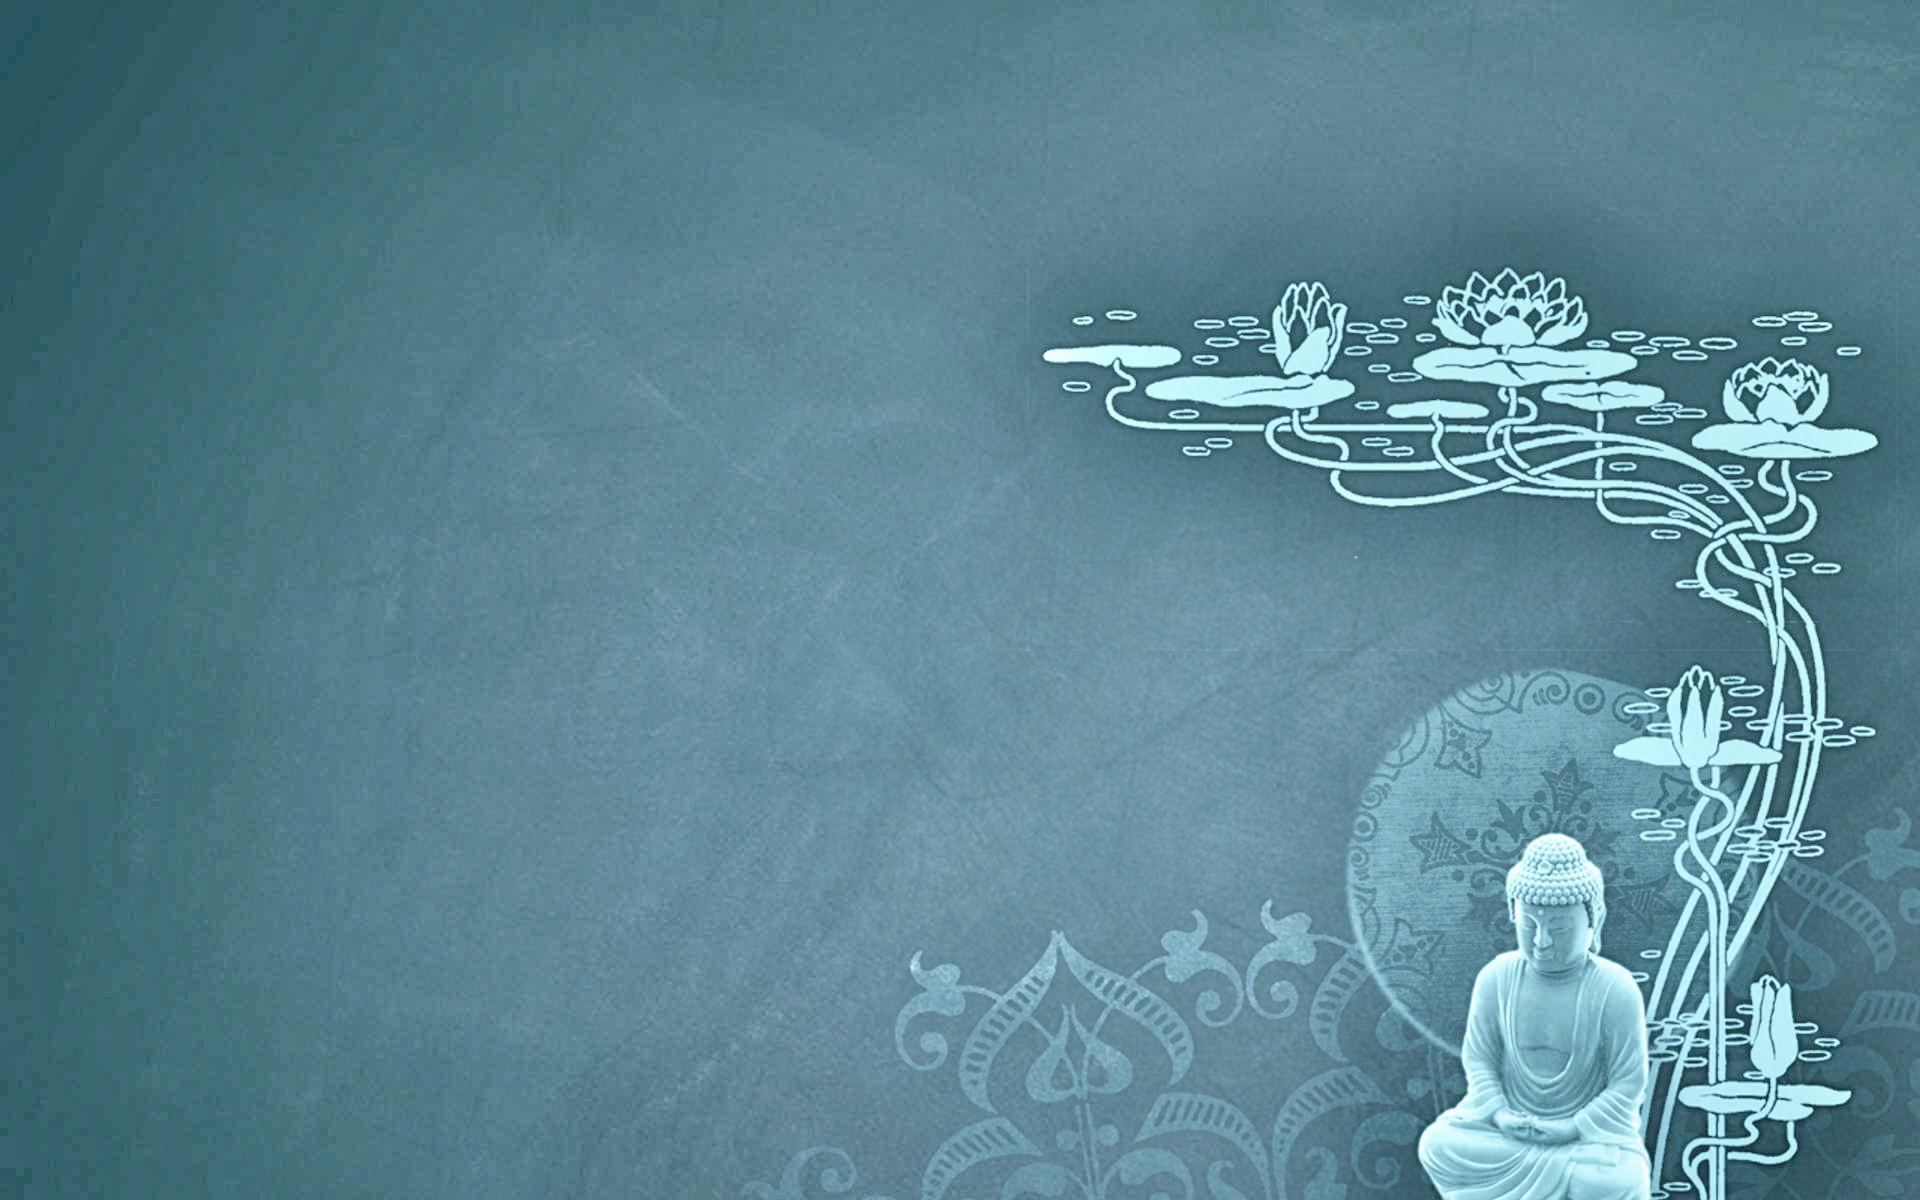 buddhism Wallpaper Background 39398 1920x1200